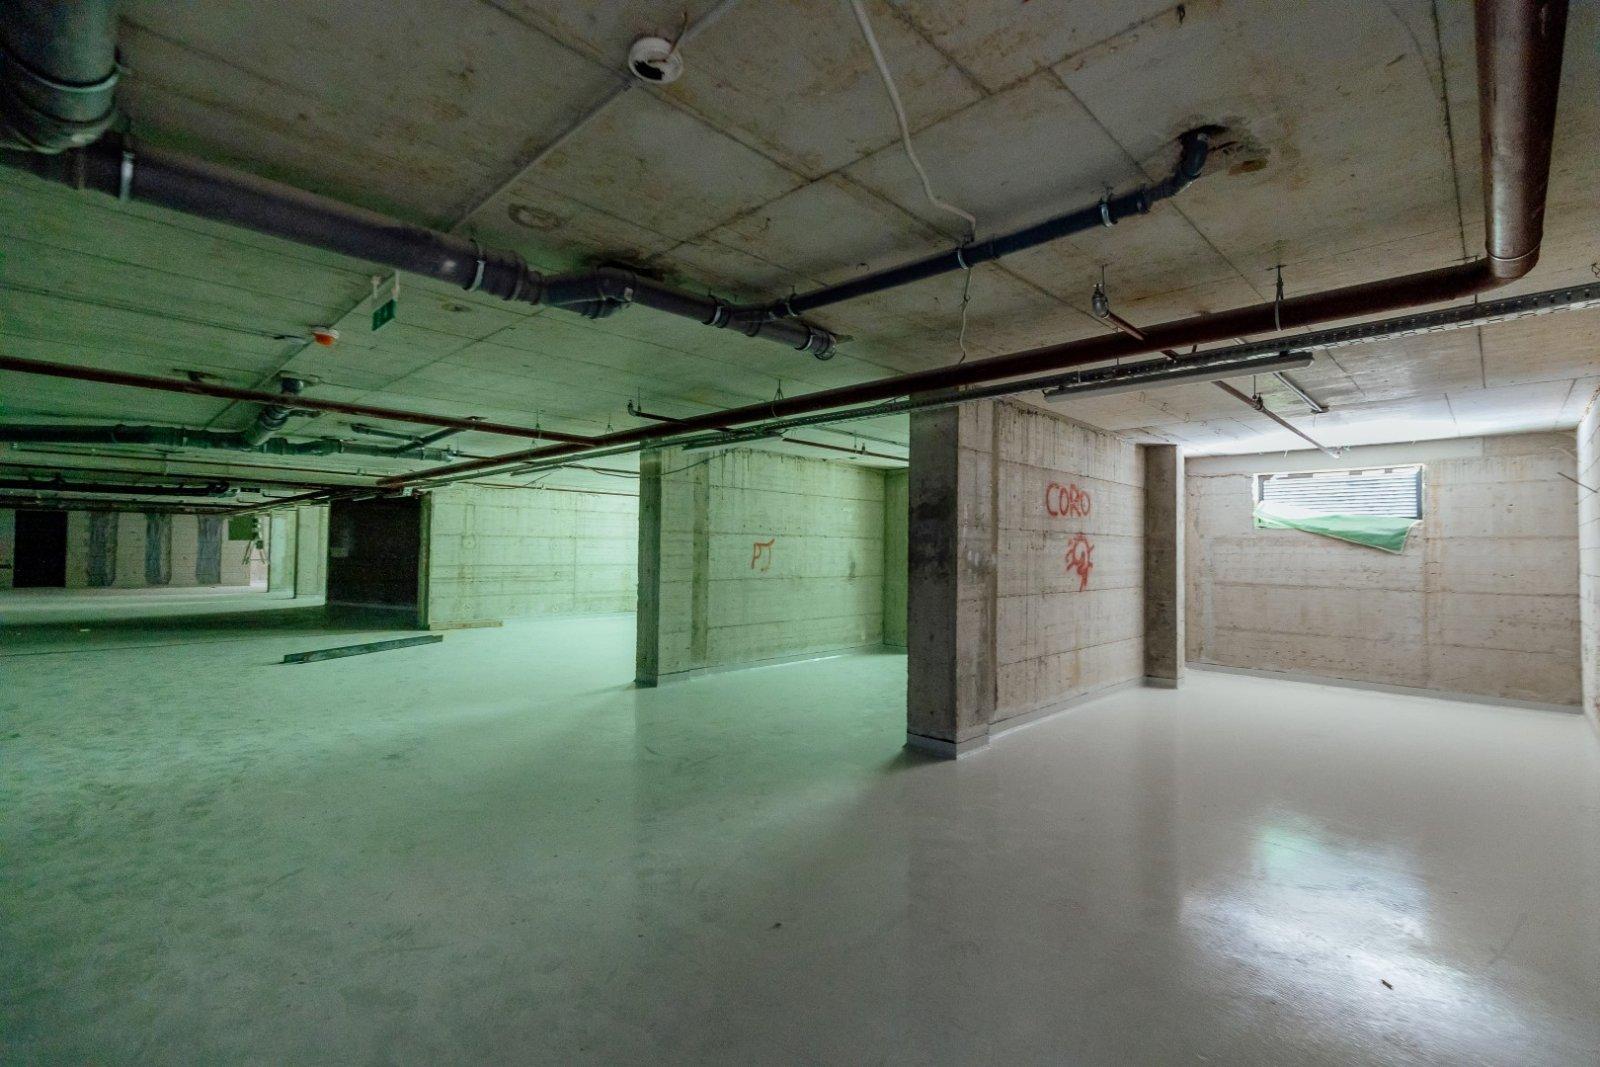 amforaproperty.com/JEDNOSOBAN STAN 49m2 - THE OLD BAKERY - BUDVA